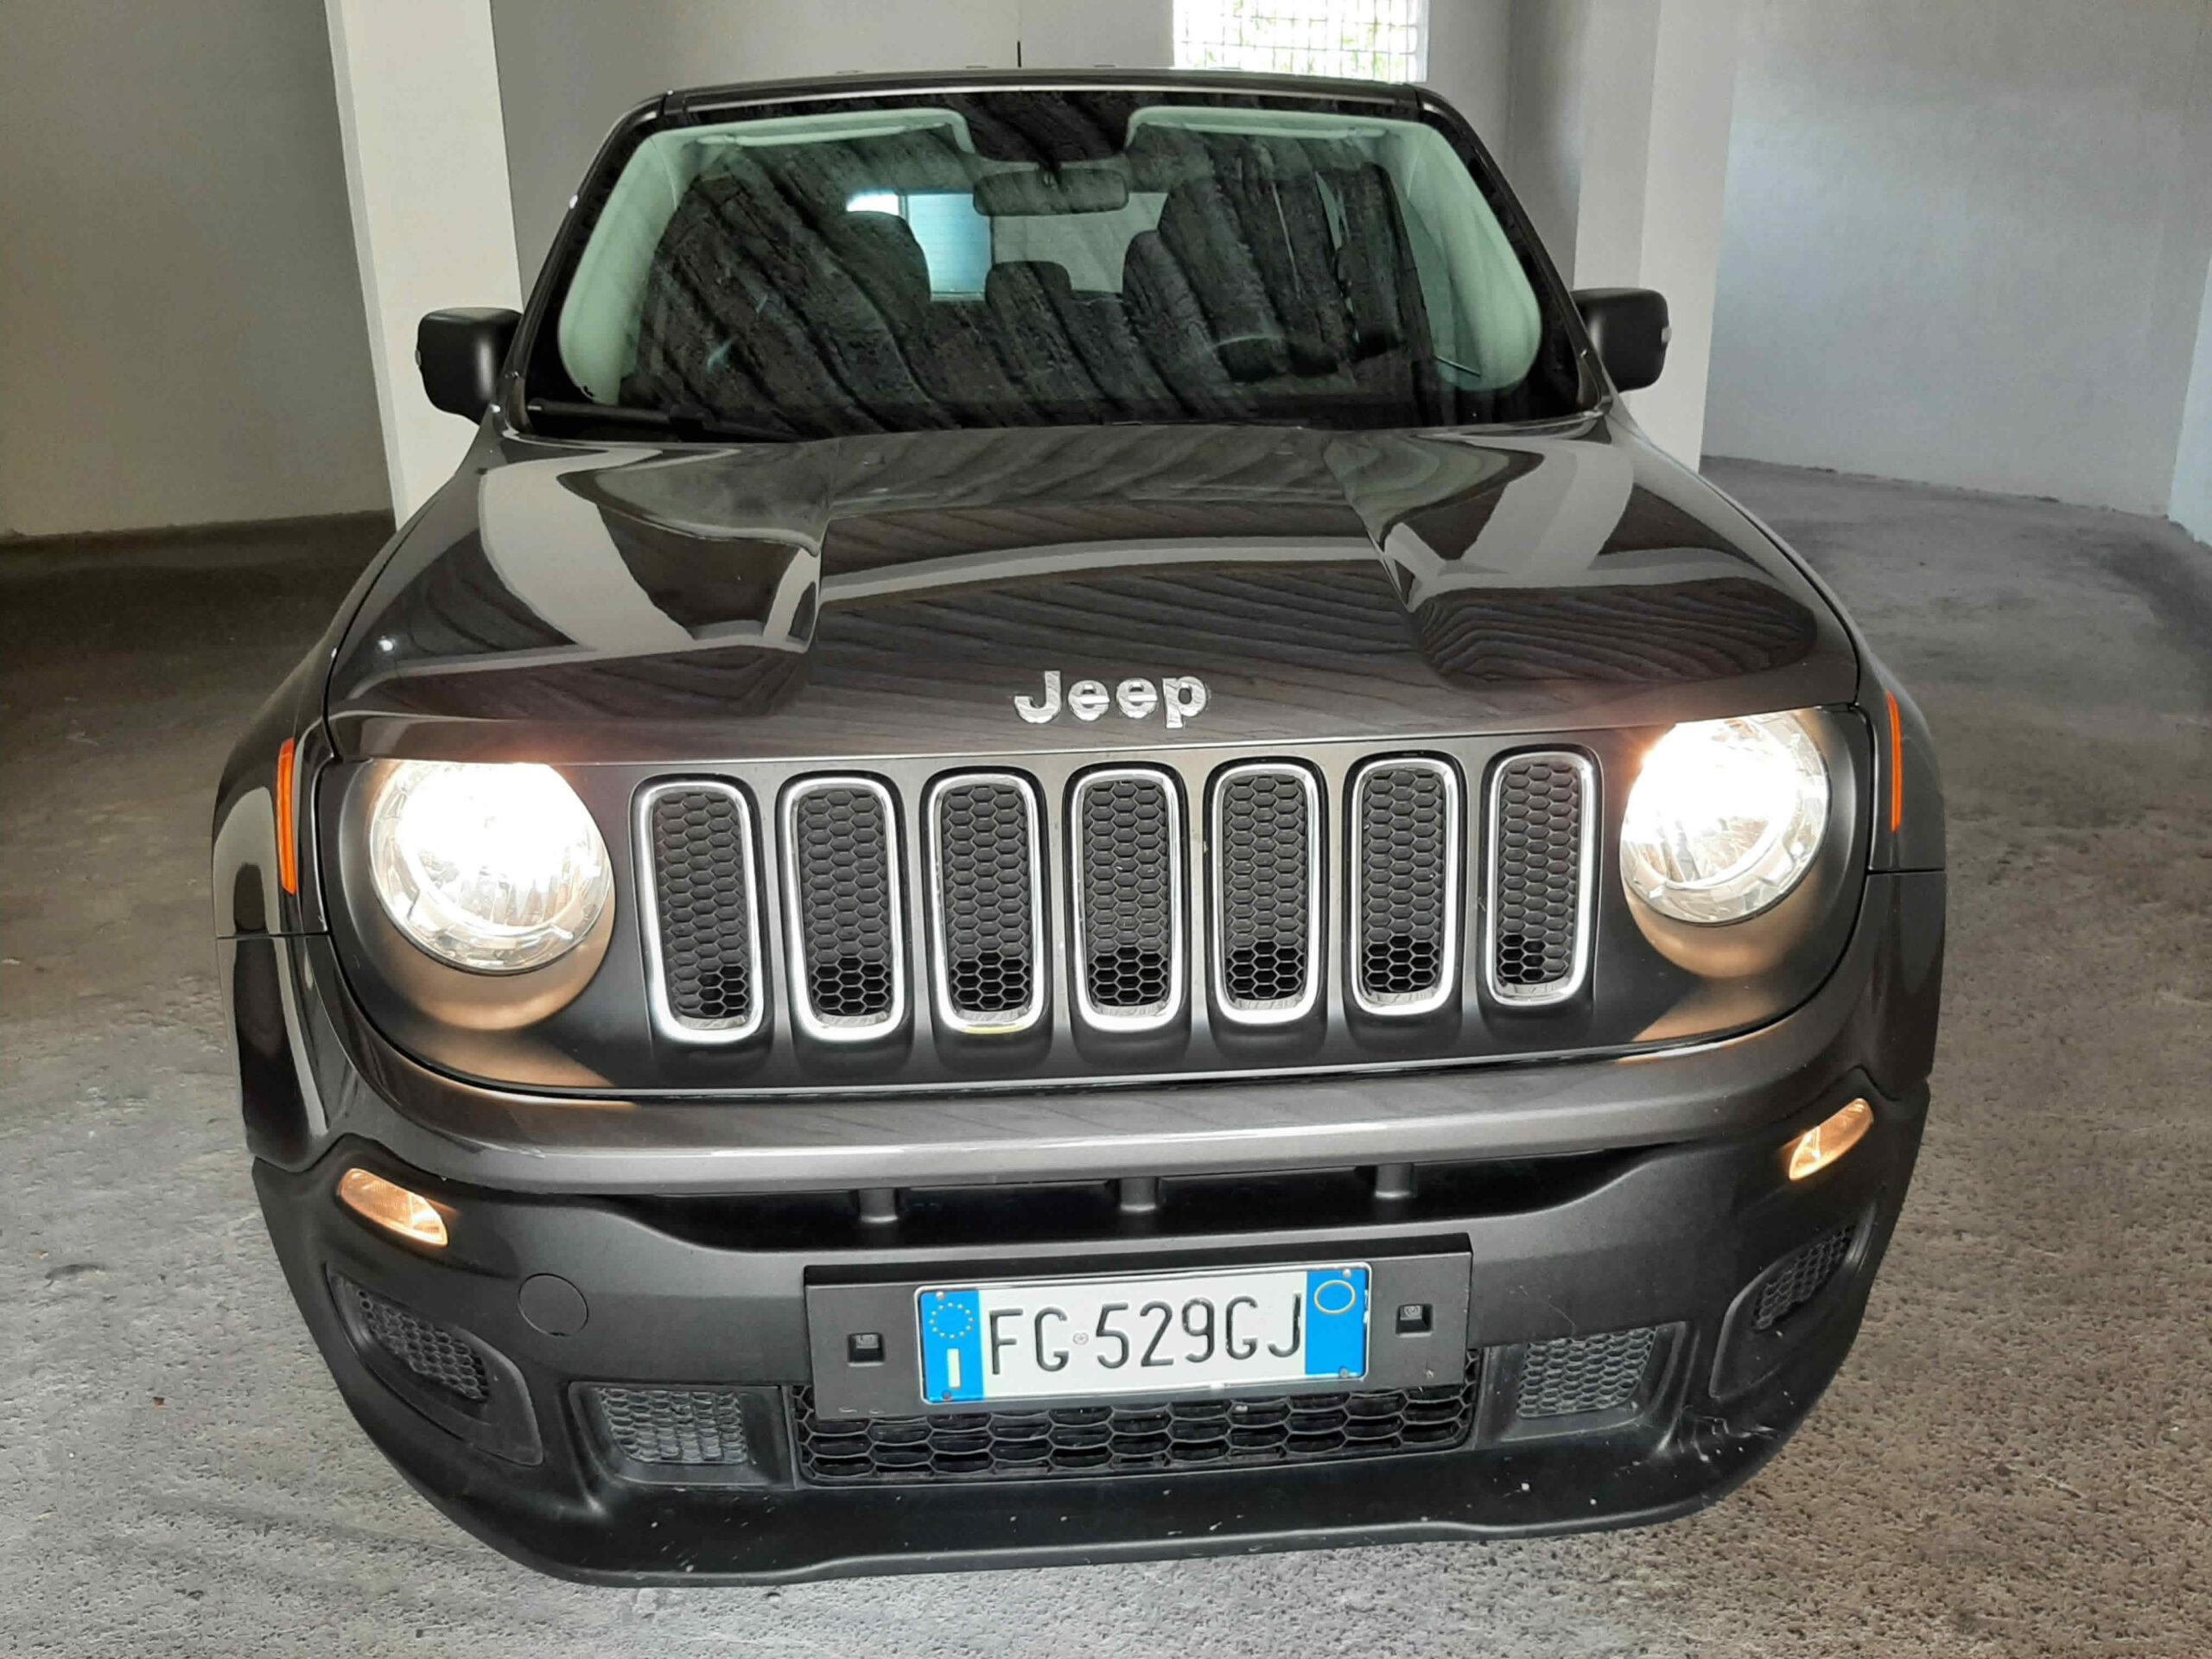 JEEP RENEGADE 2.0 MJT 120CV4X4 - €15.500